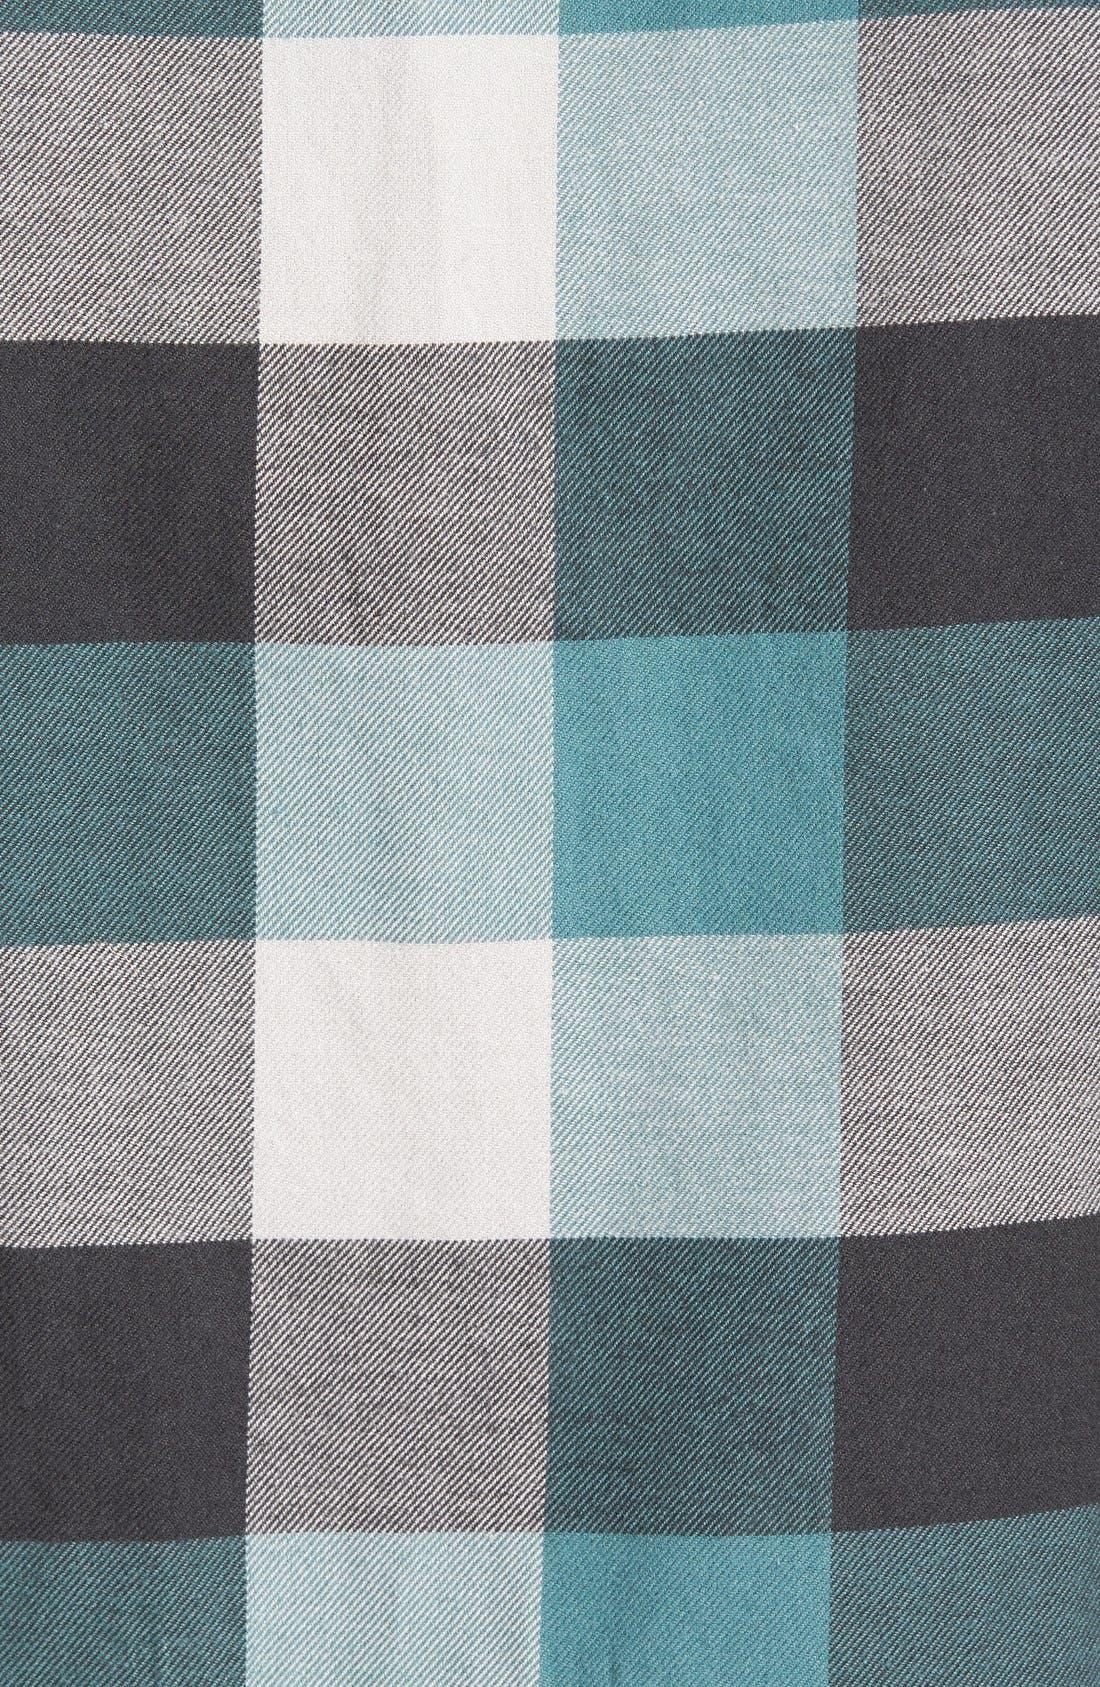 Trim Fit Check Flannel Woven Shirt,                             Alternate thumbnail 9, color,